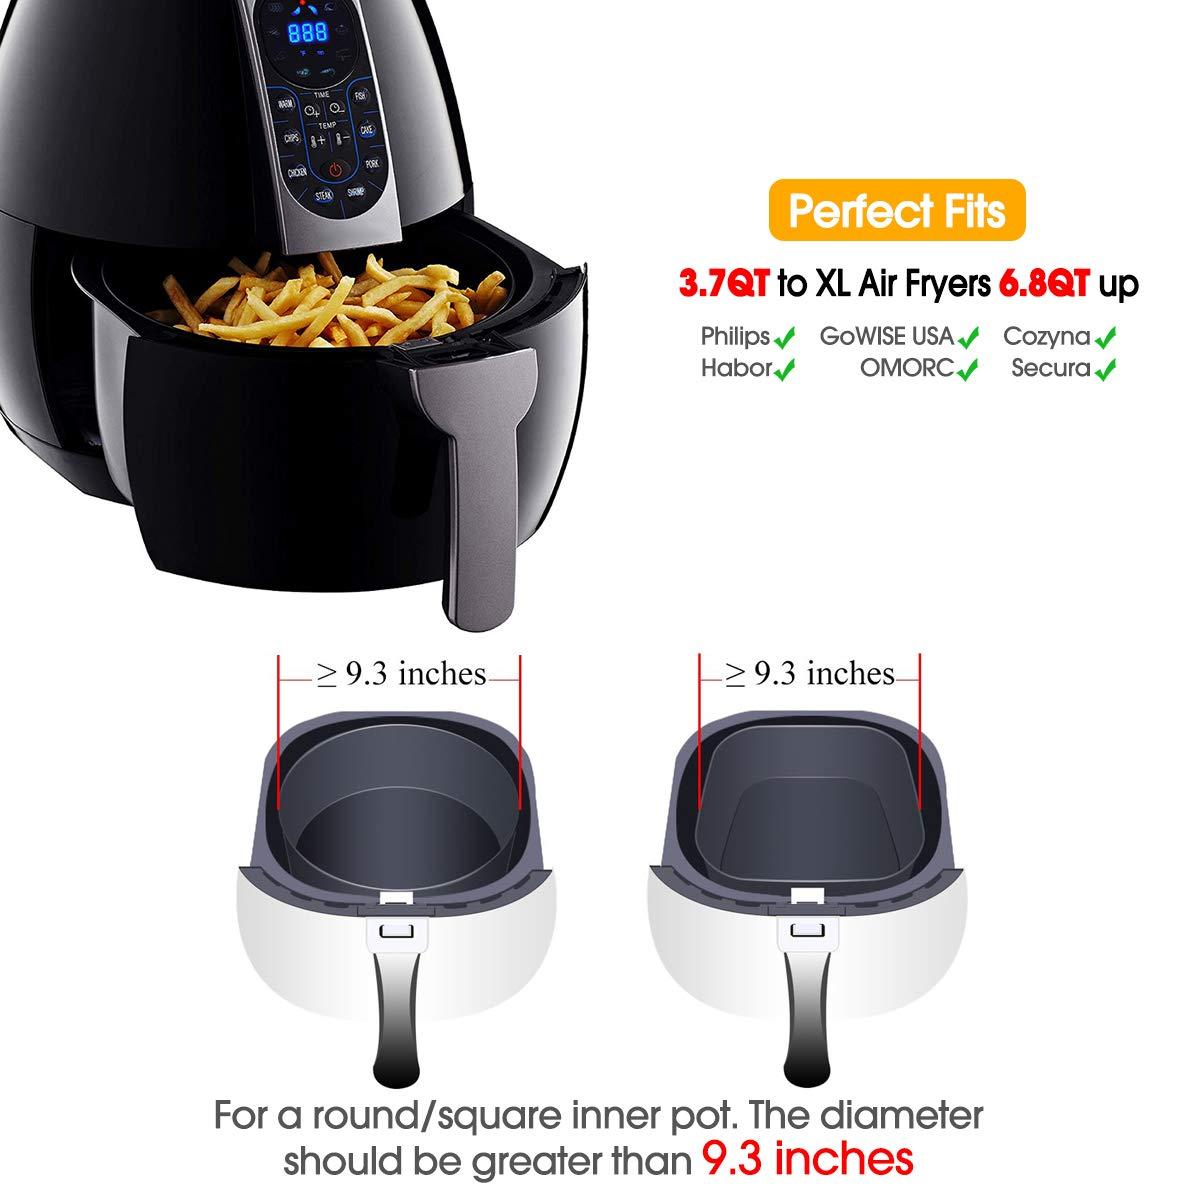 8 Inch Air Fryer Accessories Fit all 4.2QT-5.3QT-5.8QT-6.8QT Air Fryer 13 Pcs Deep Fryer Accessories with Recipe Cookbook for Growise Phillips Cozyna Airfryer